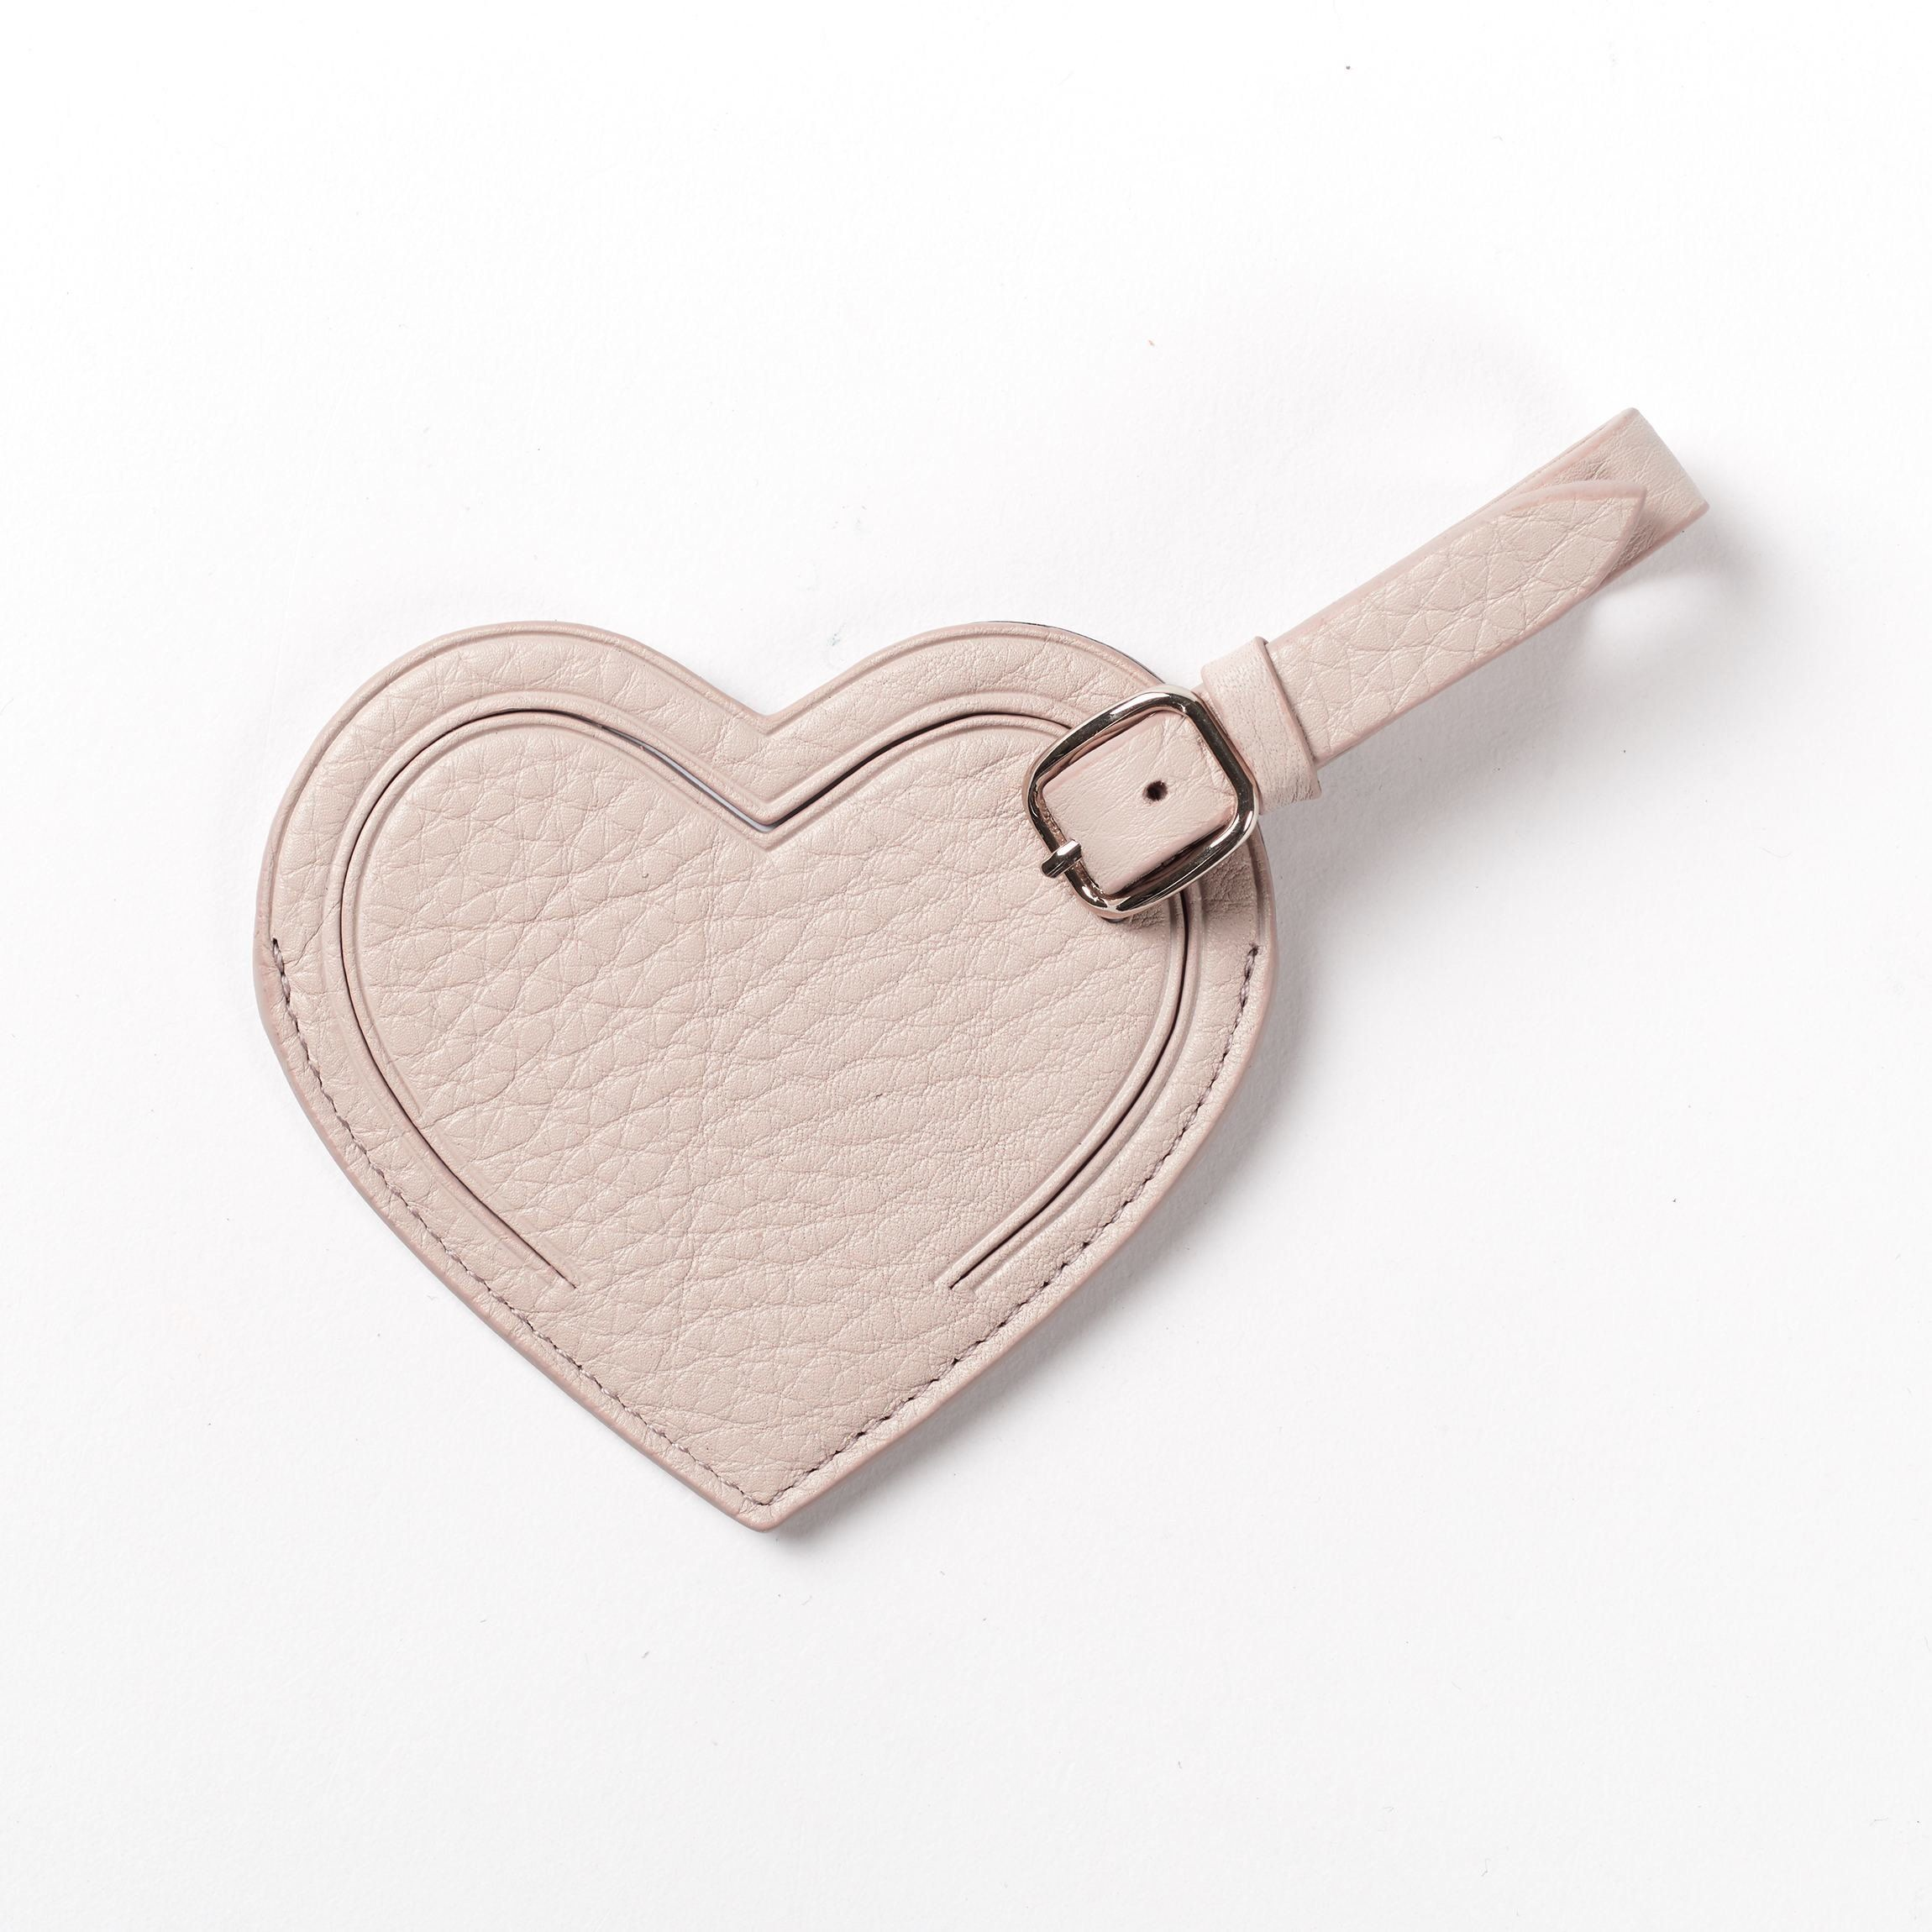 e4b497eee6da Small Heart Luggage Tag - Full Grain Leather - Stone (gray ...